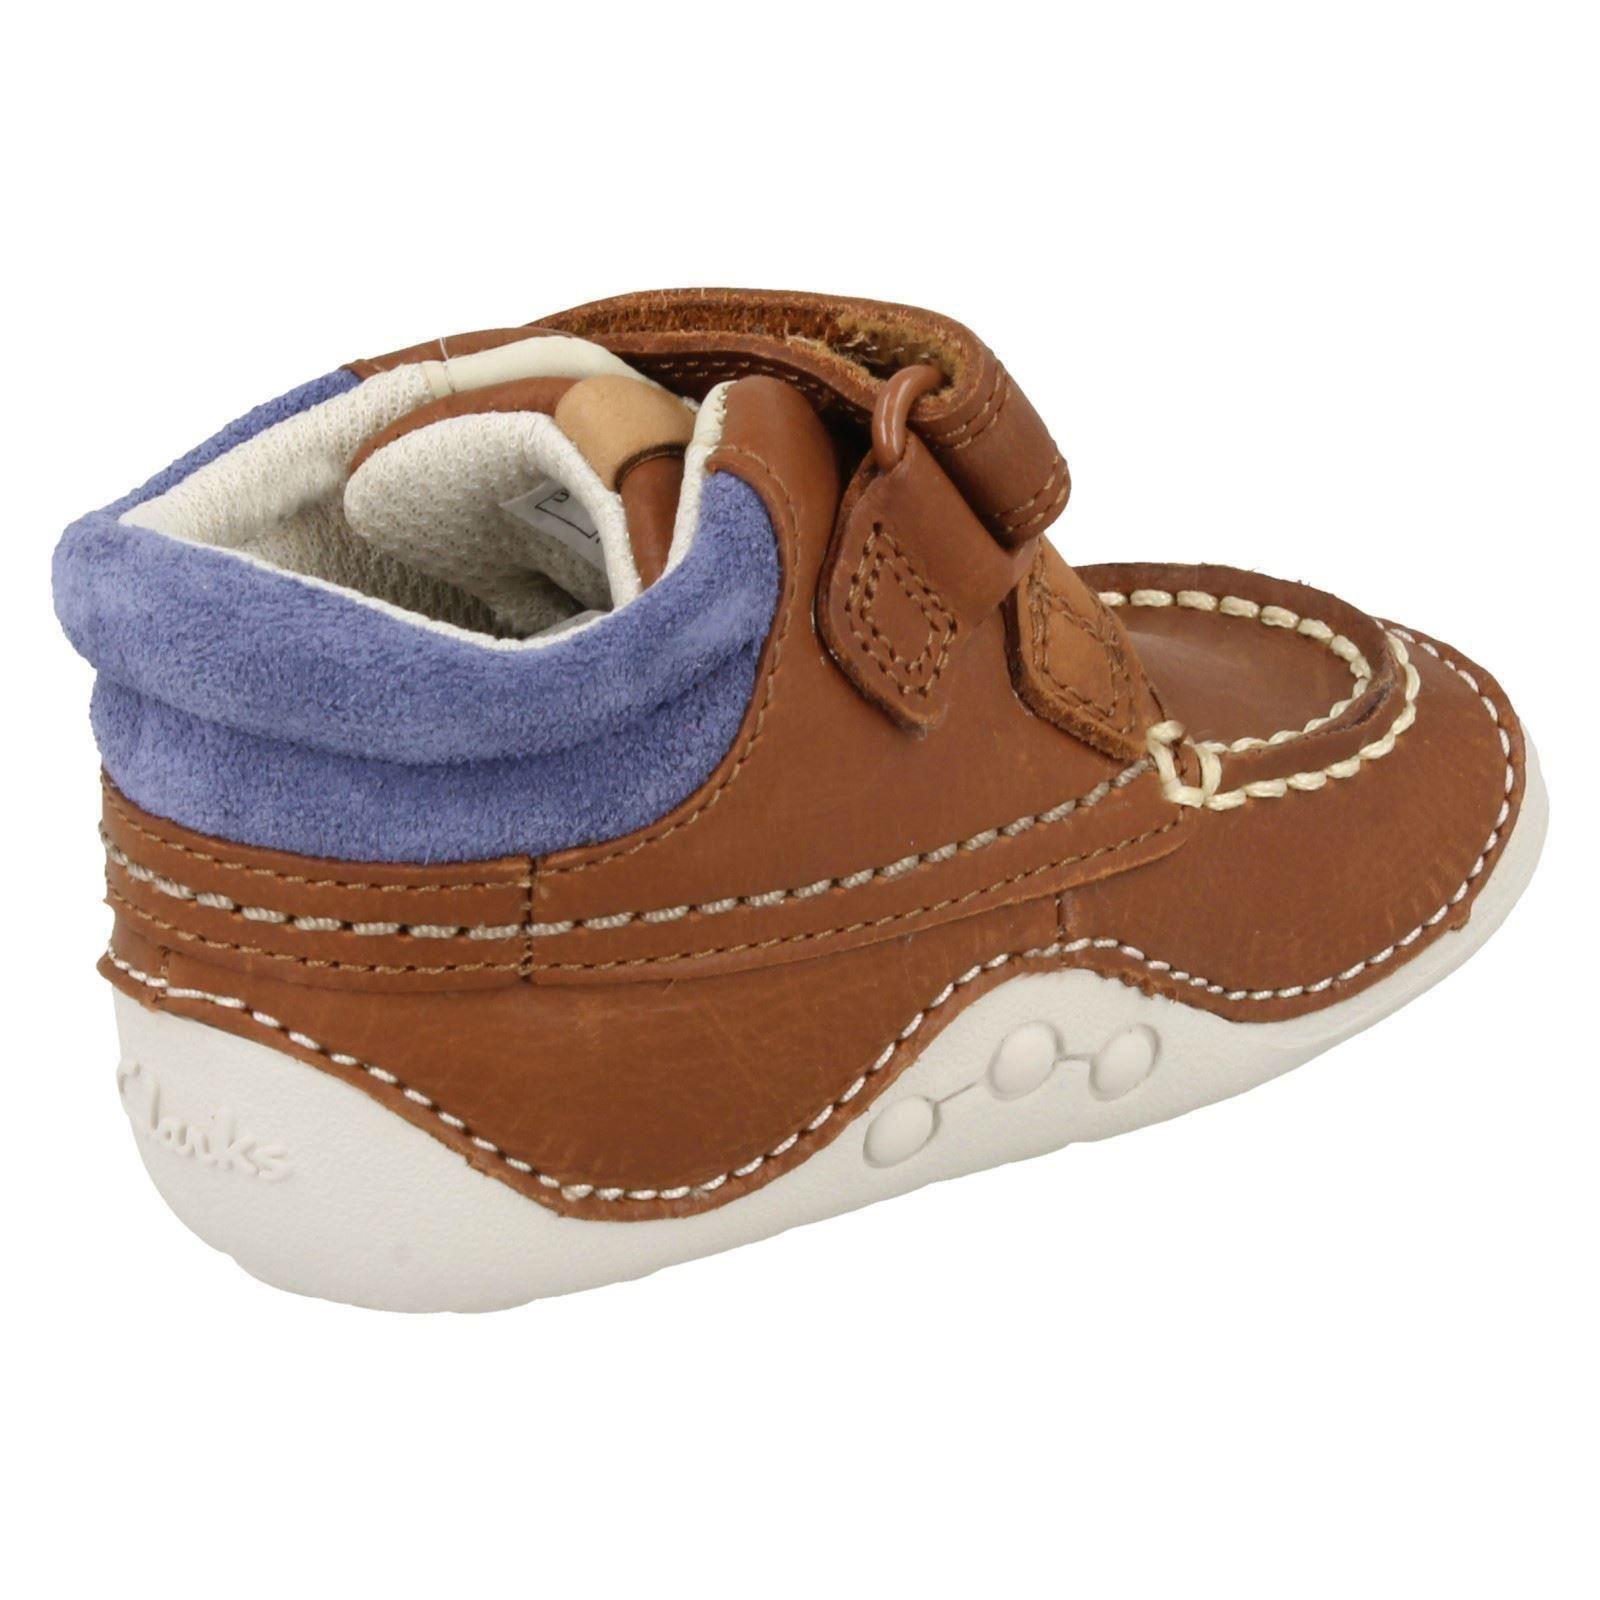 Primeros Pequeño Clarks Niños Tuktu Zapatos zUfwPqqX